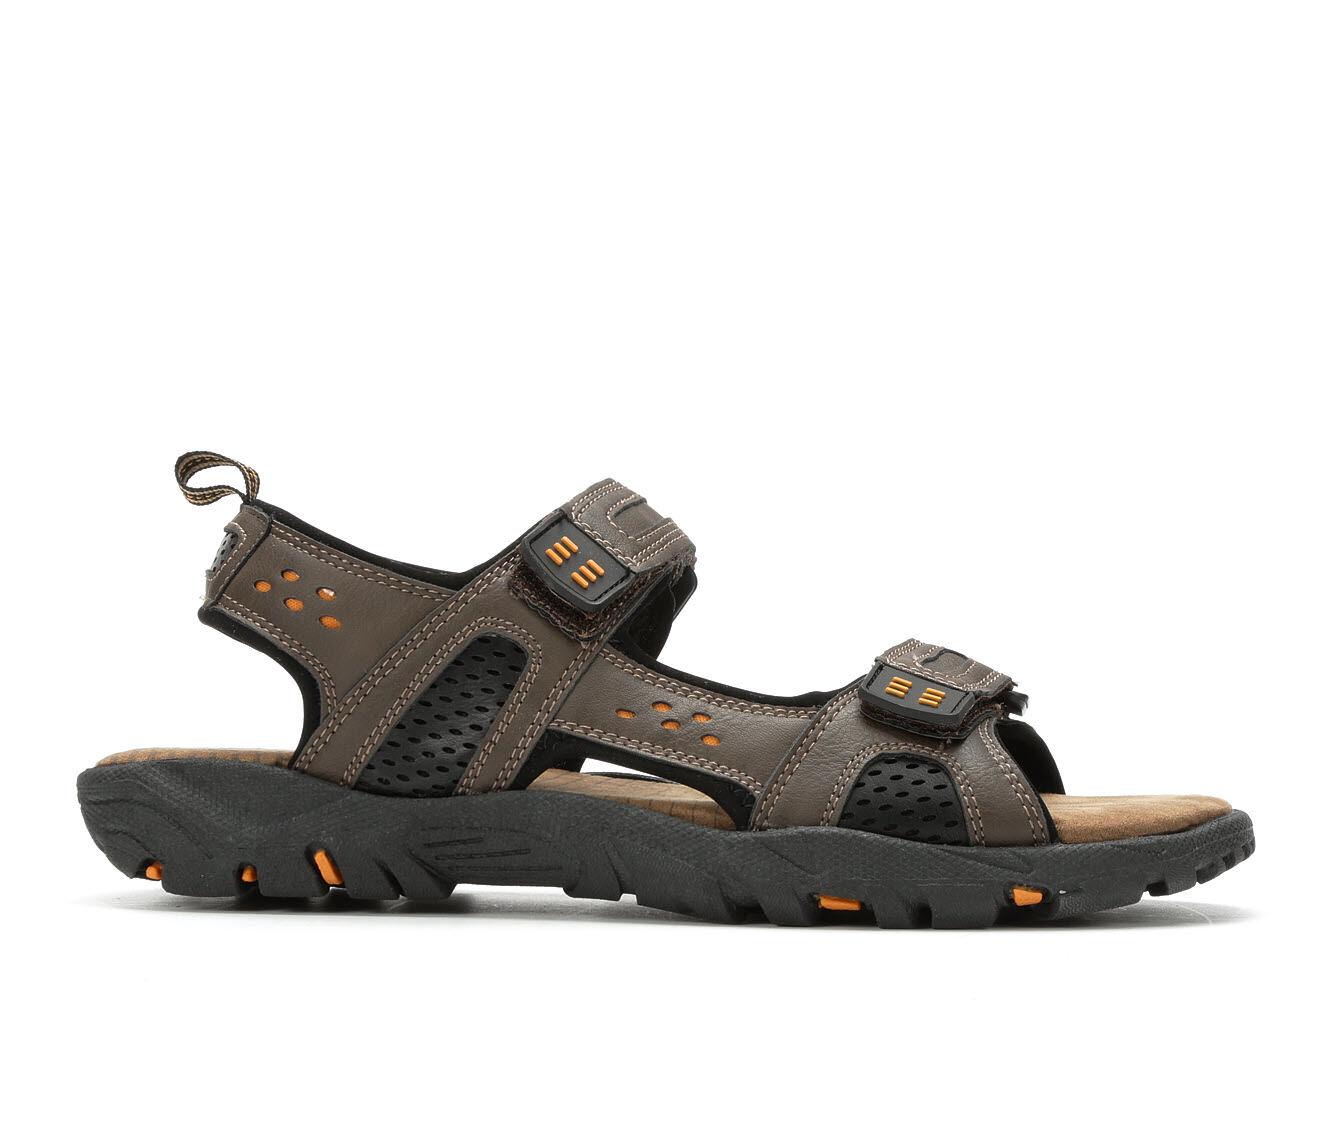 Men's Gotcha Current Outdoor Sandals cheap sale Cheapest outlet pick a best 0bGk7Rynn